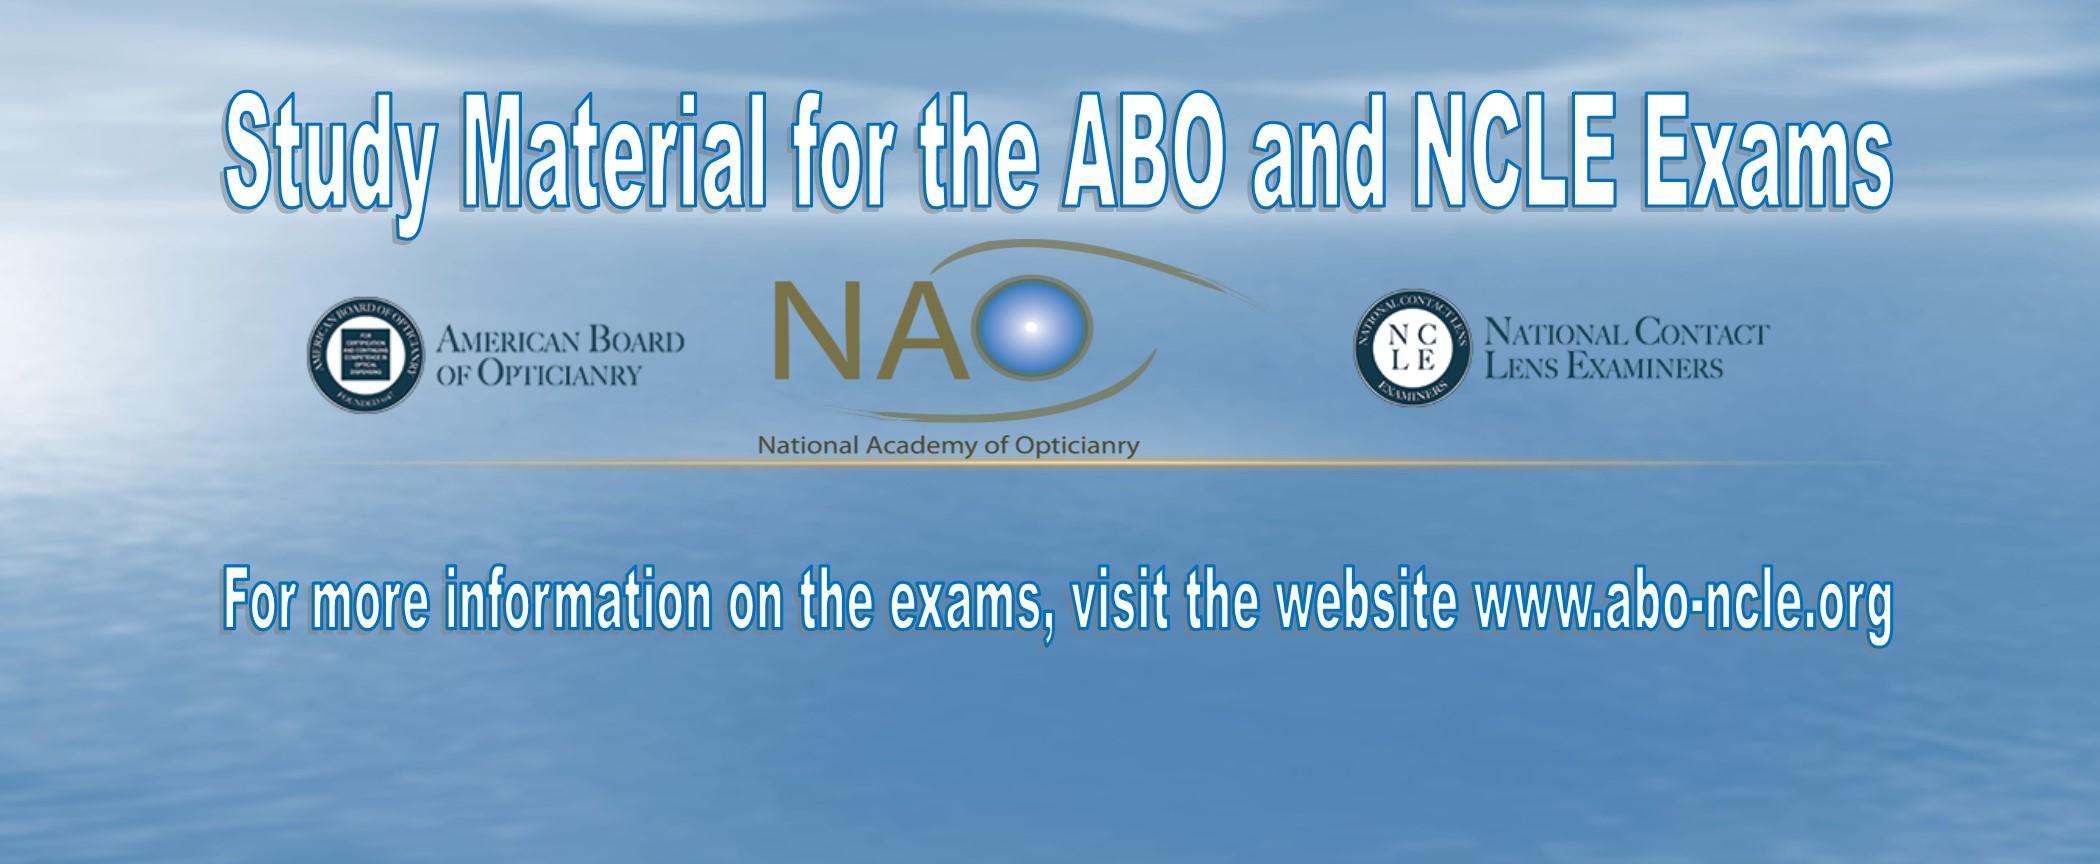 Exam-Study-Material